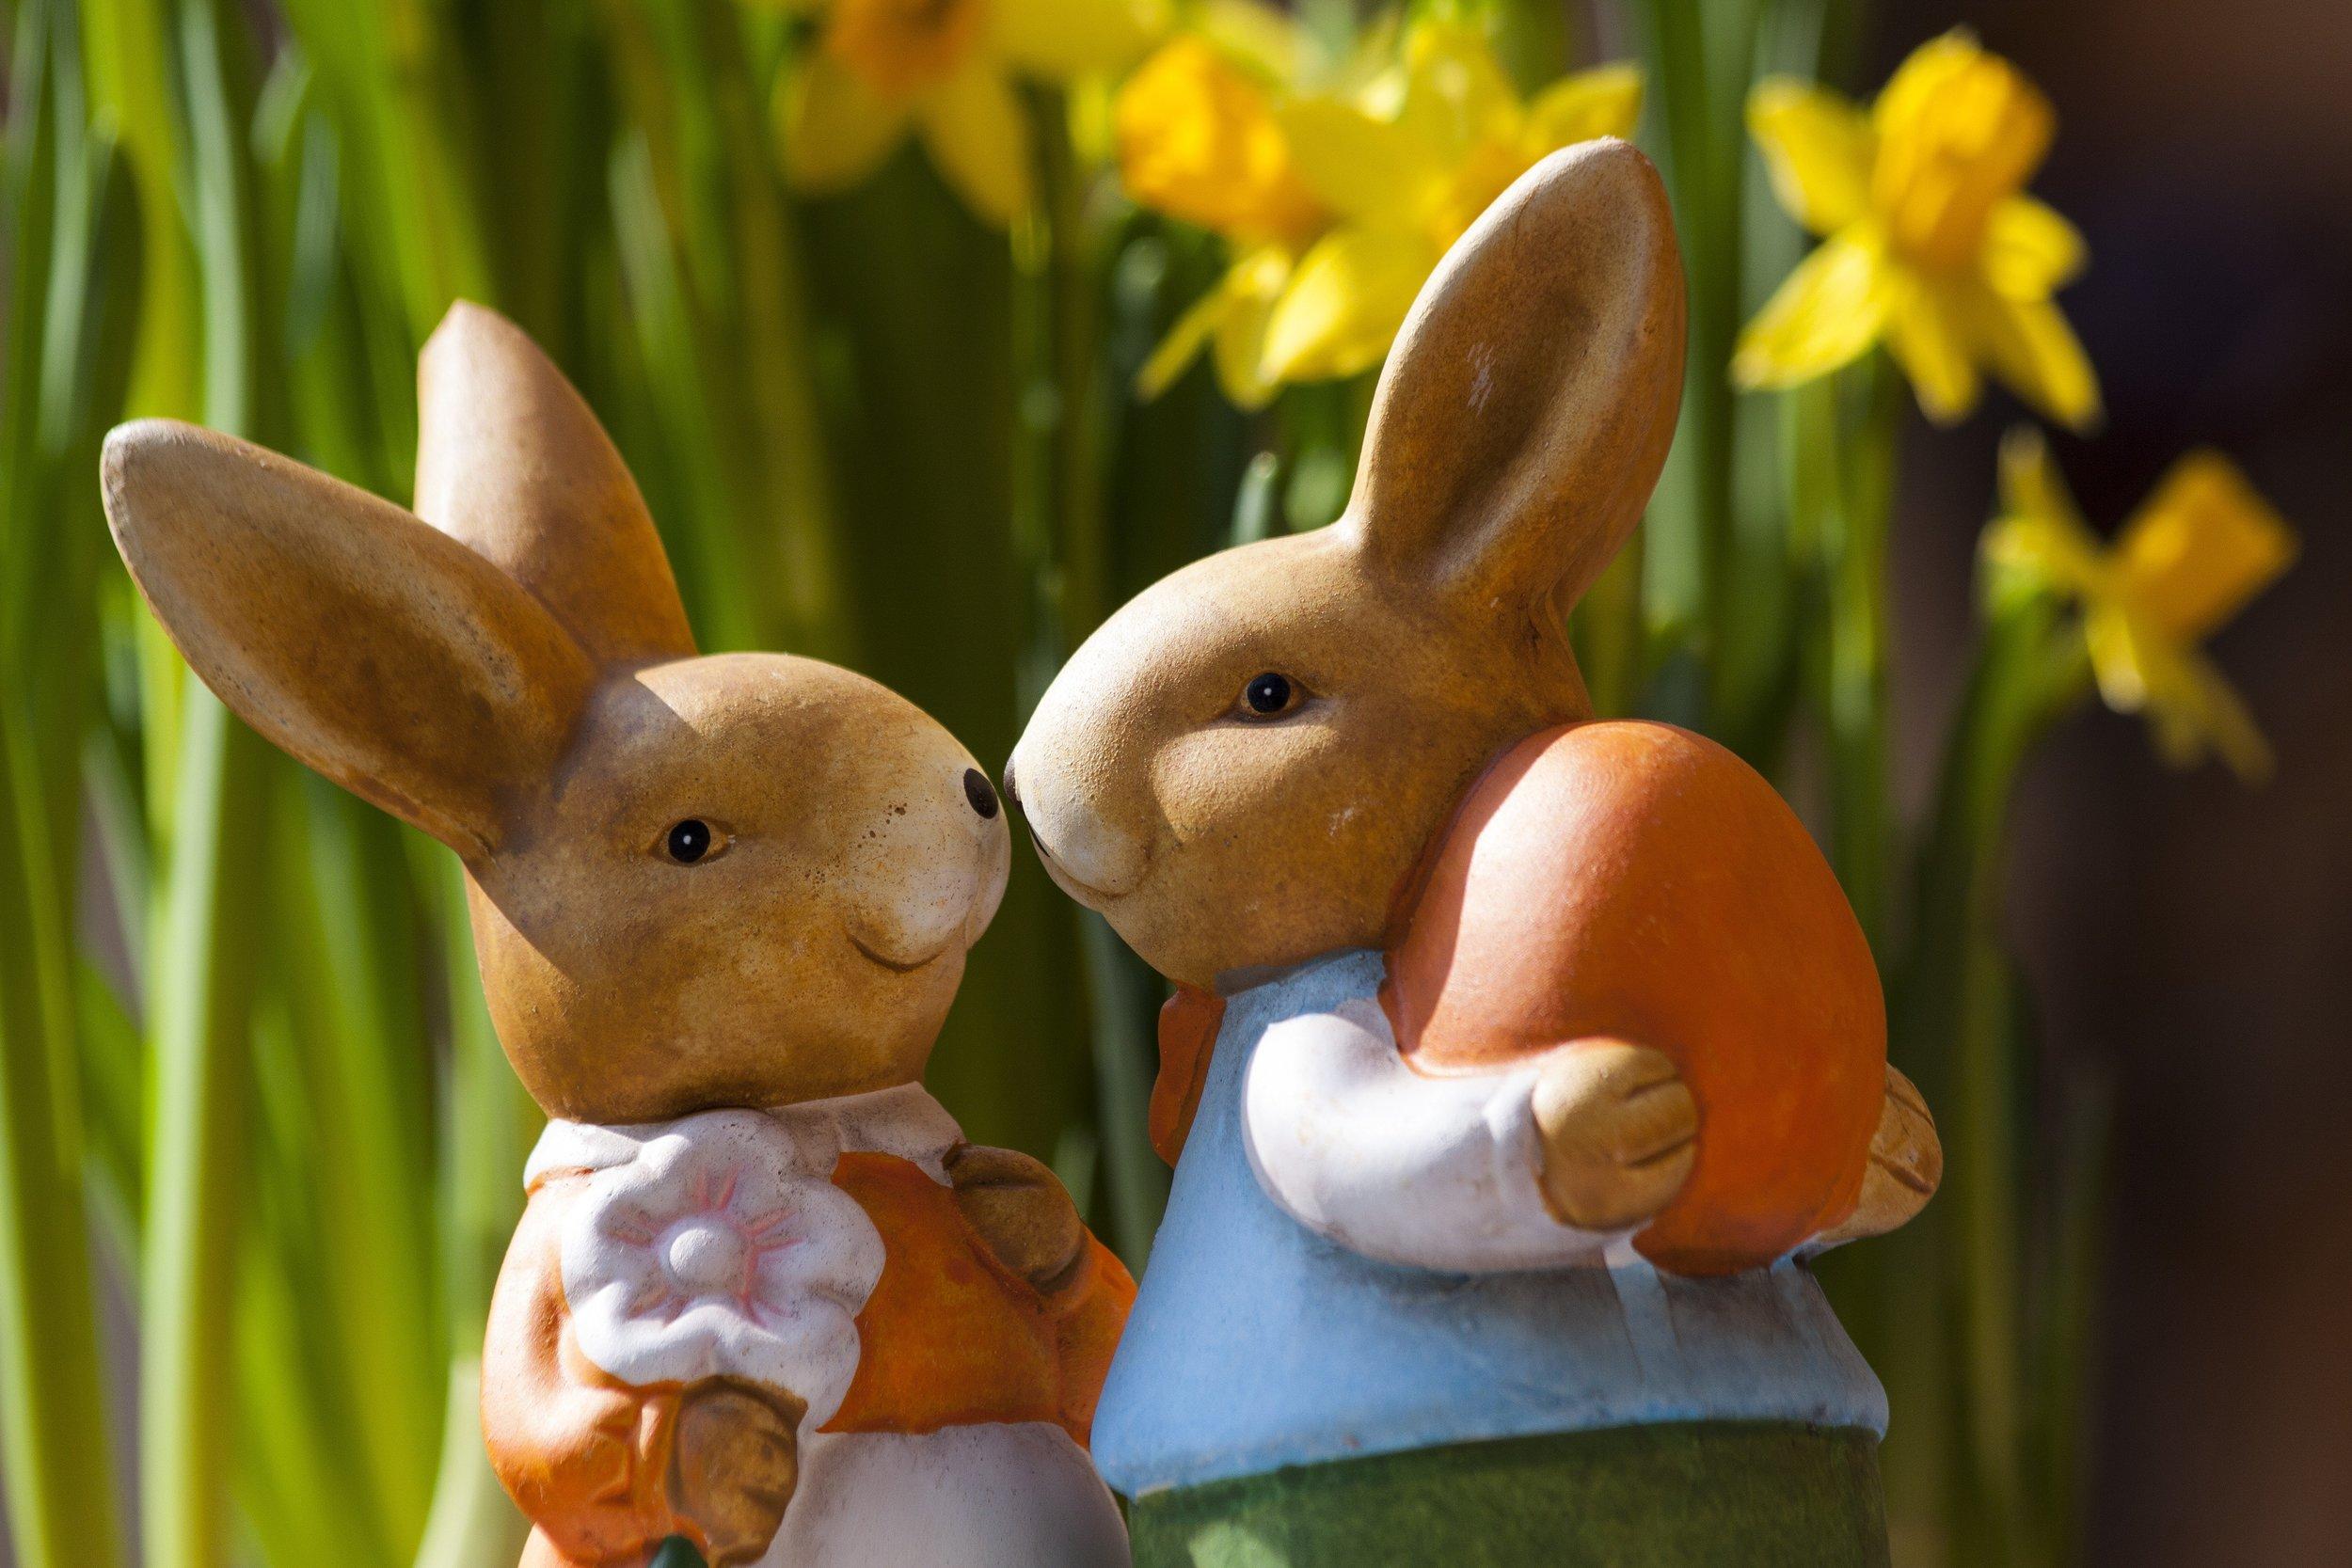 easter bunnies kissing noses royalty free.jpg